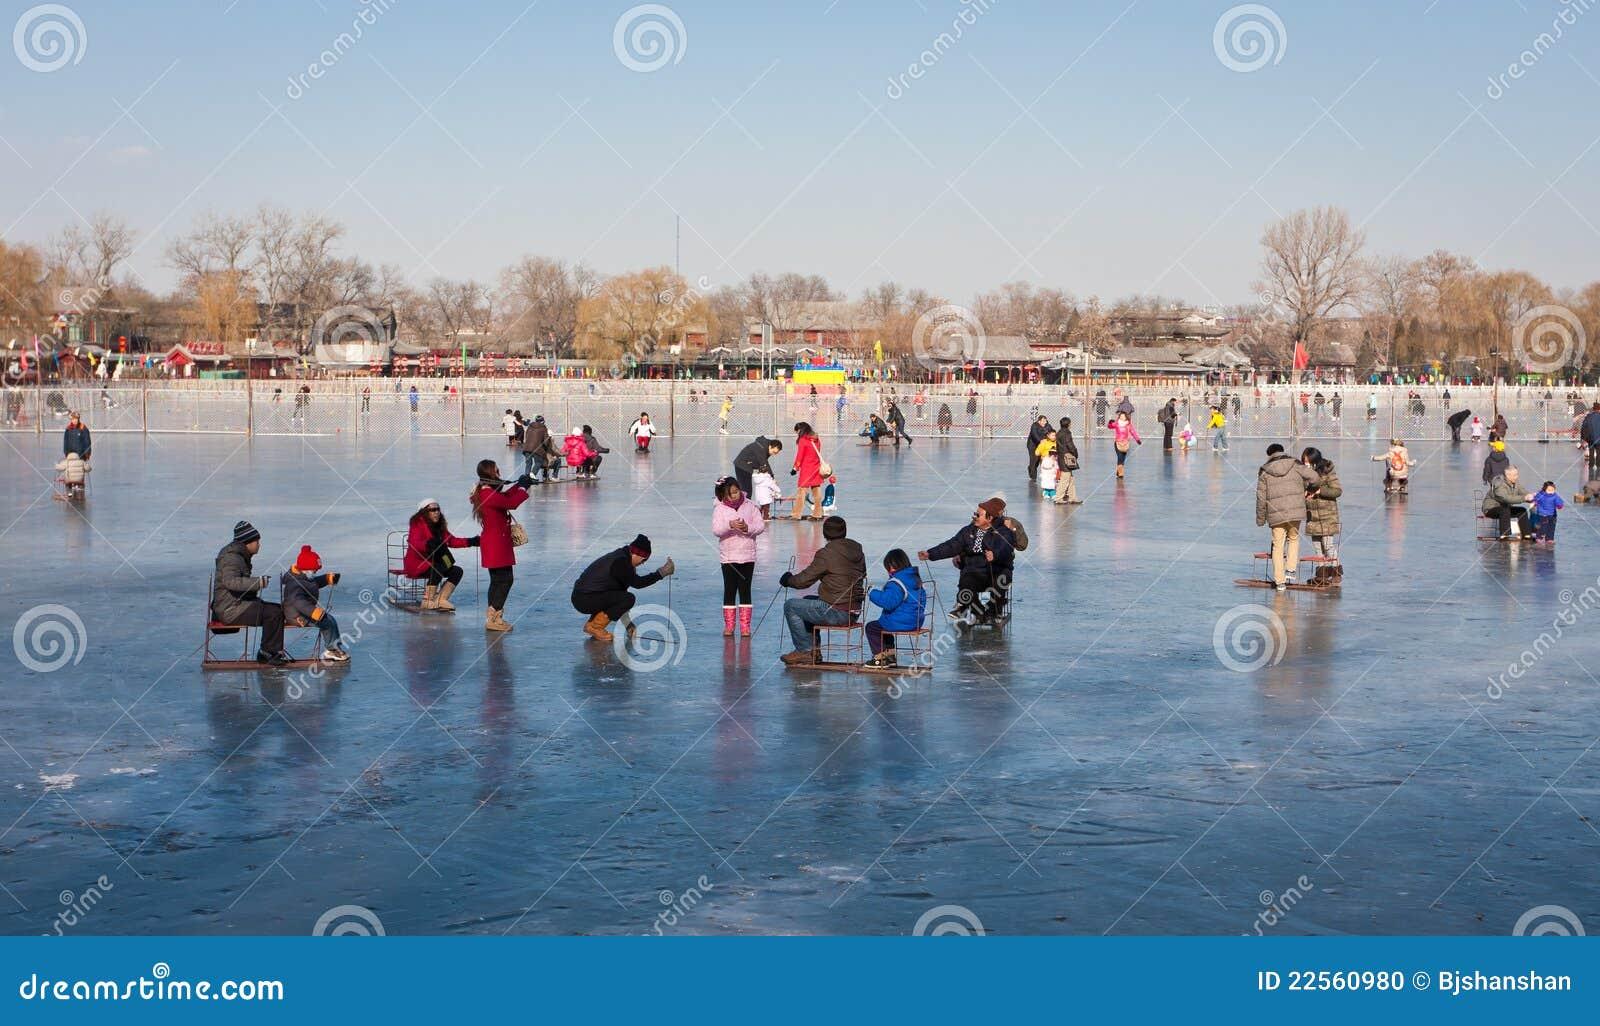 Beijing skating in Shichahai